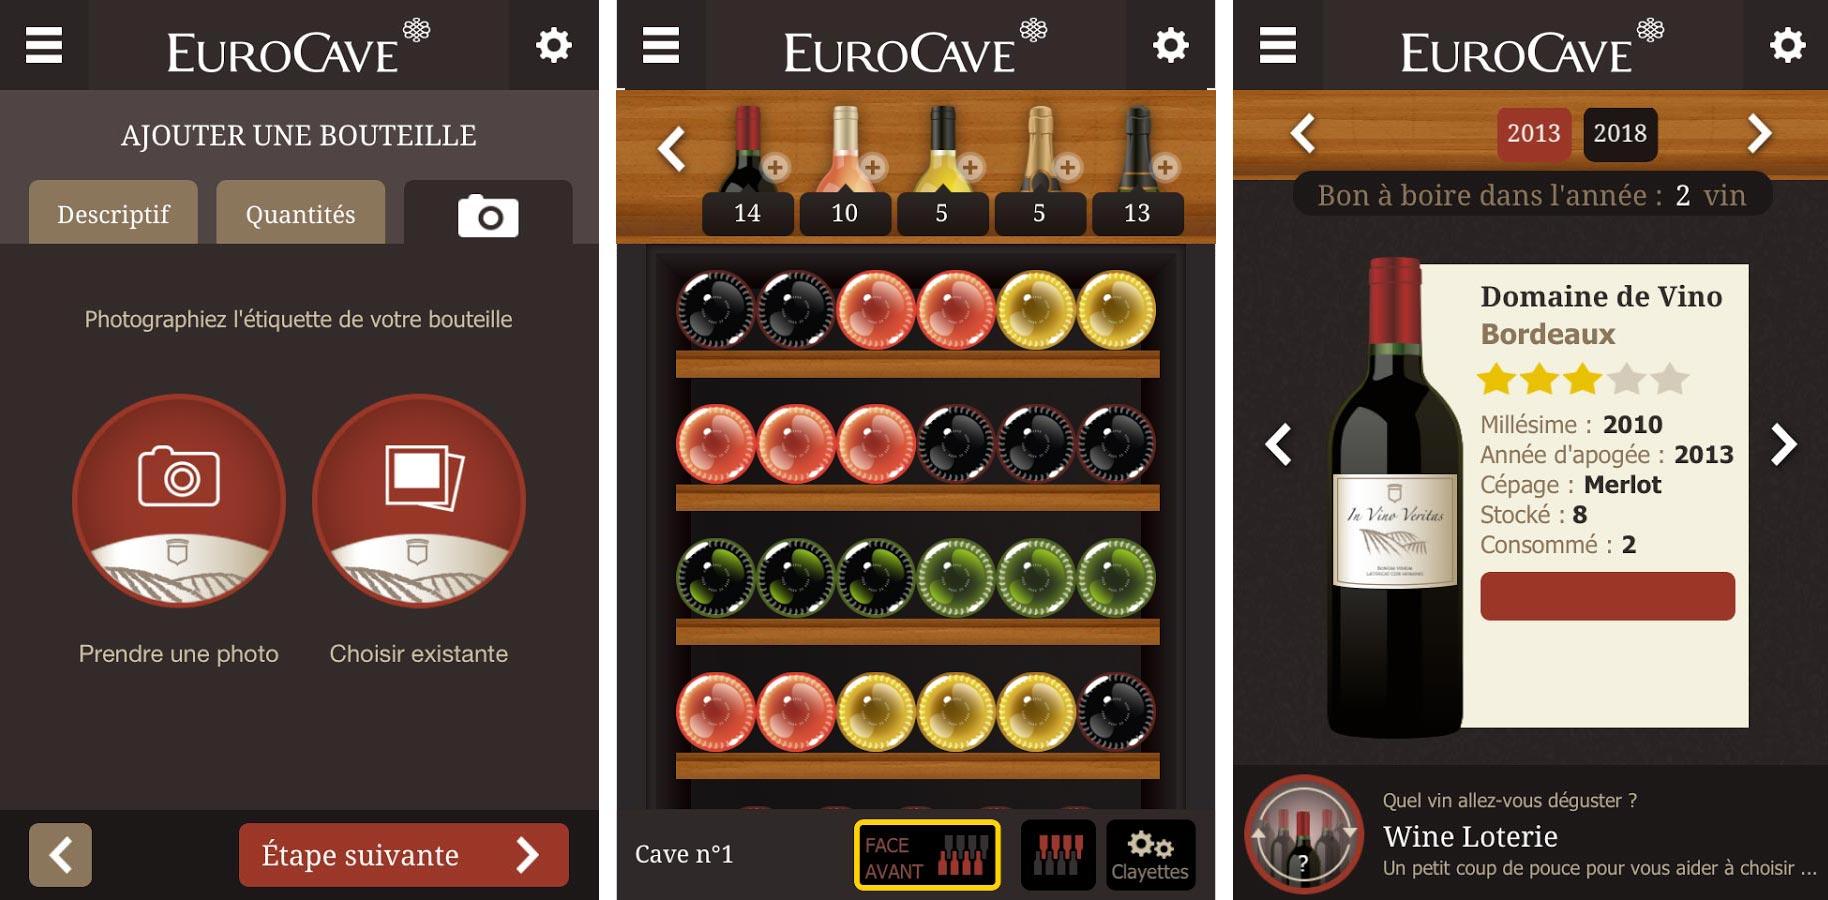 application gratuite android eurocave pour g rer sa cave vin. Black Bedroom Furniture Sets. Home Design Ideas